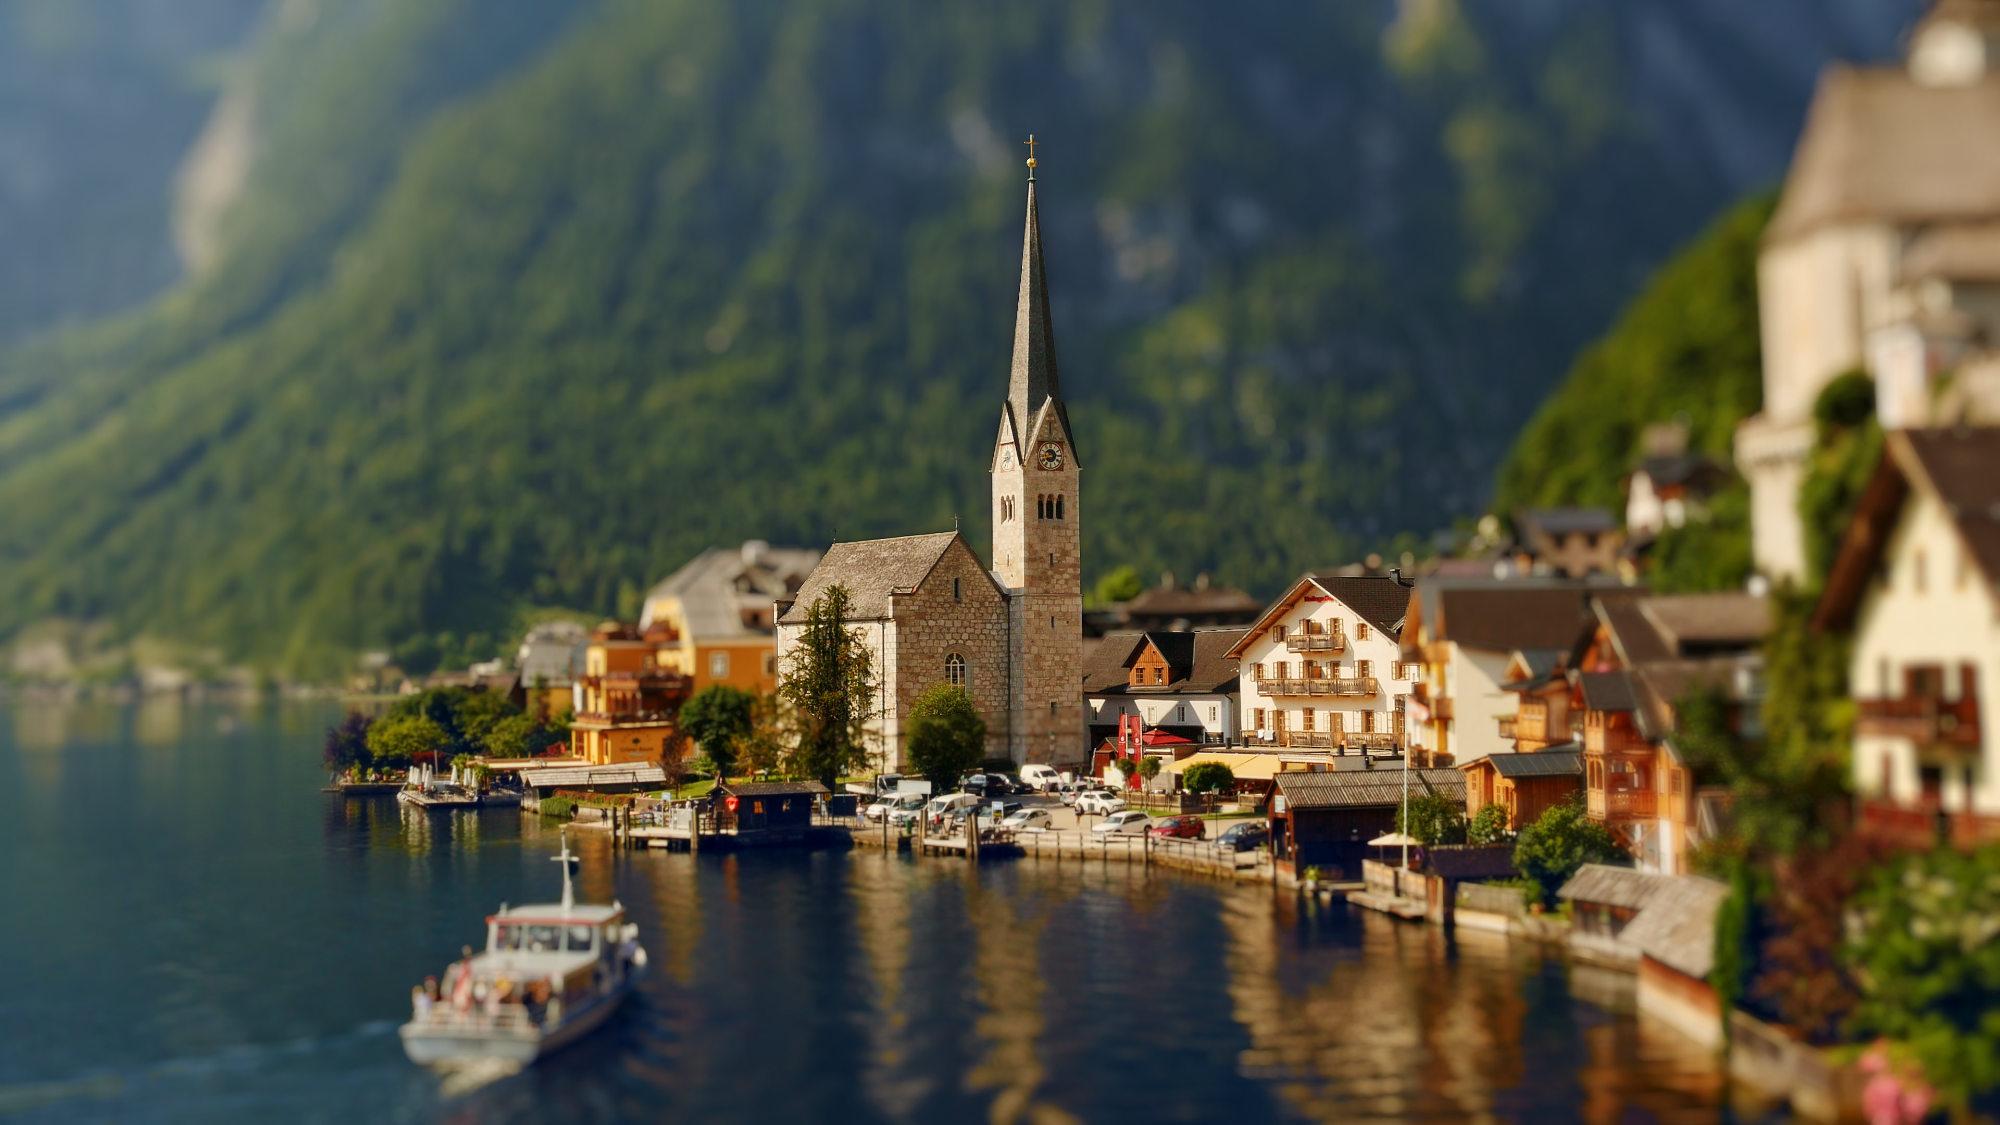 Insta view of Hallstatt, Austria in miniature look. Screenshot from tilt shift time lapse video